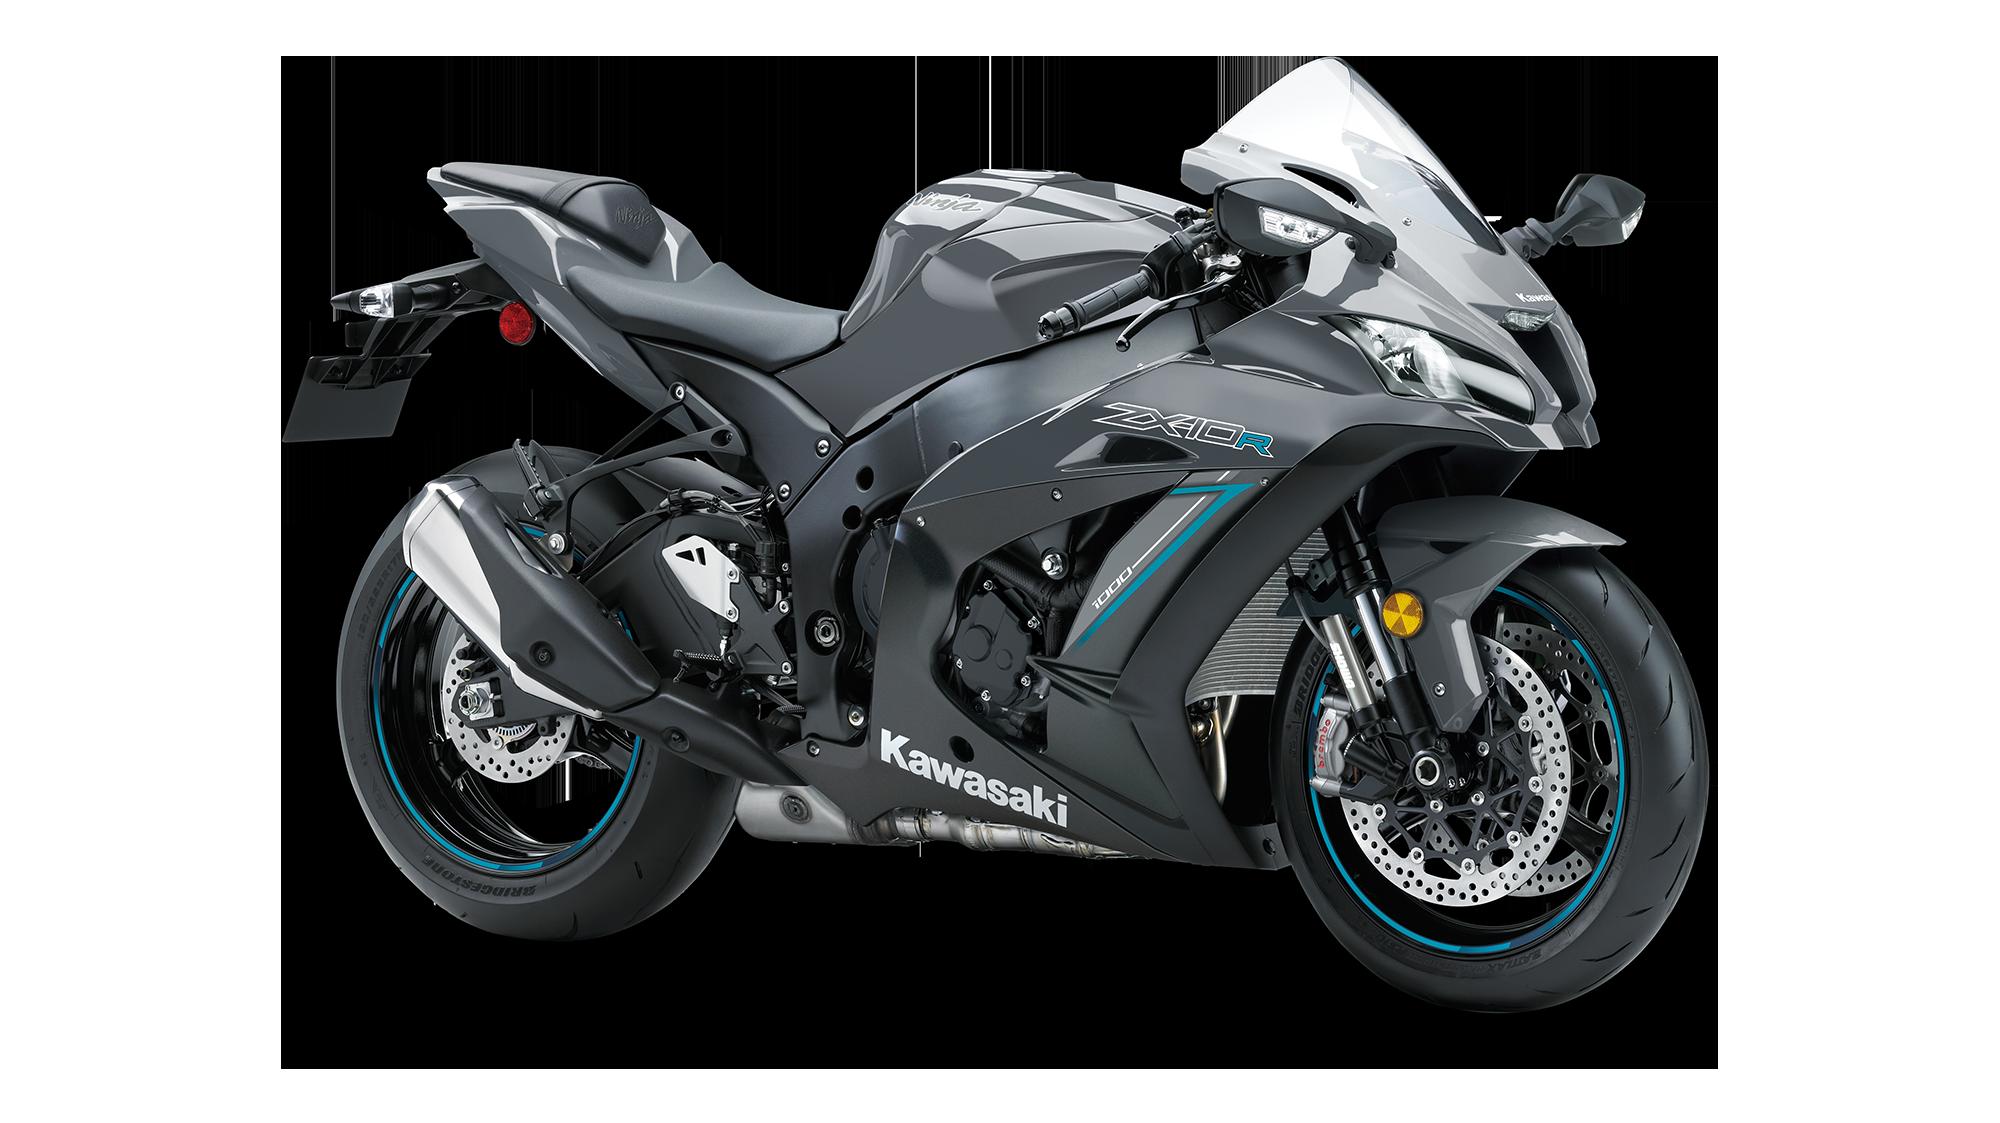 Kawasaki Motorcycles, Atv, Sxs, Jet Ski Personal Watercraft Kawasaki Ninja  636 Kawasaki.com Diagrams